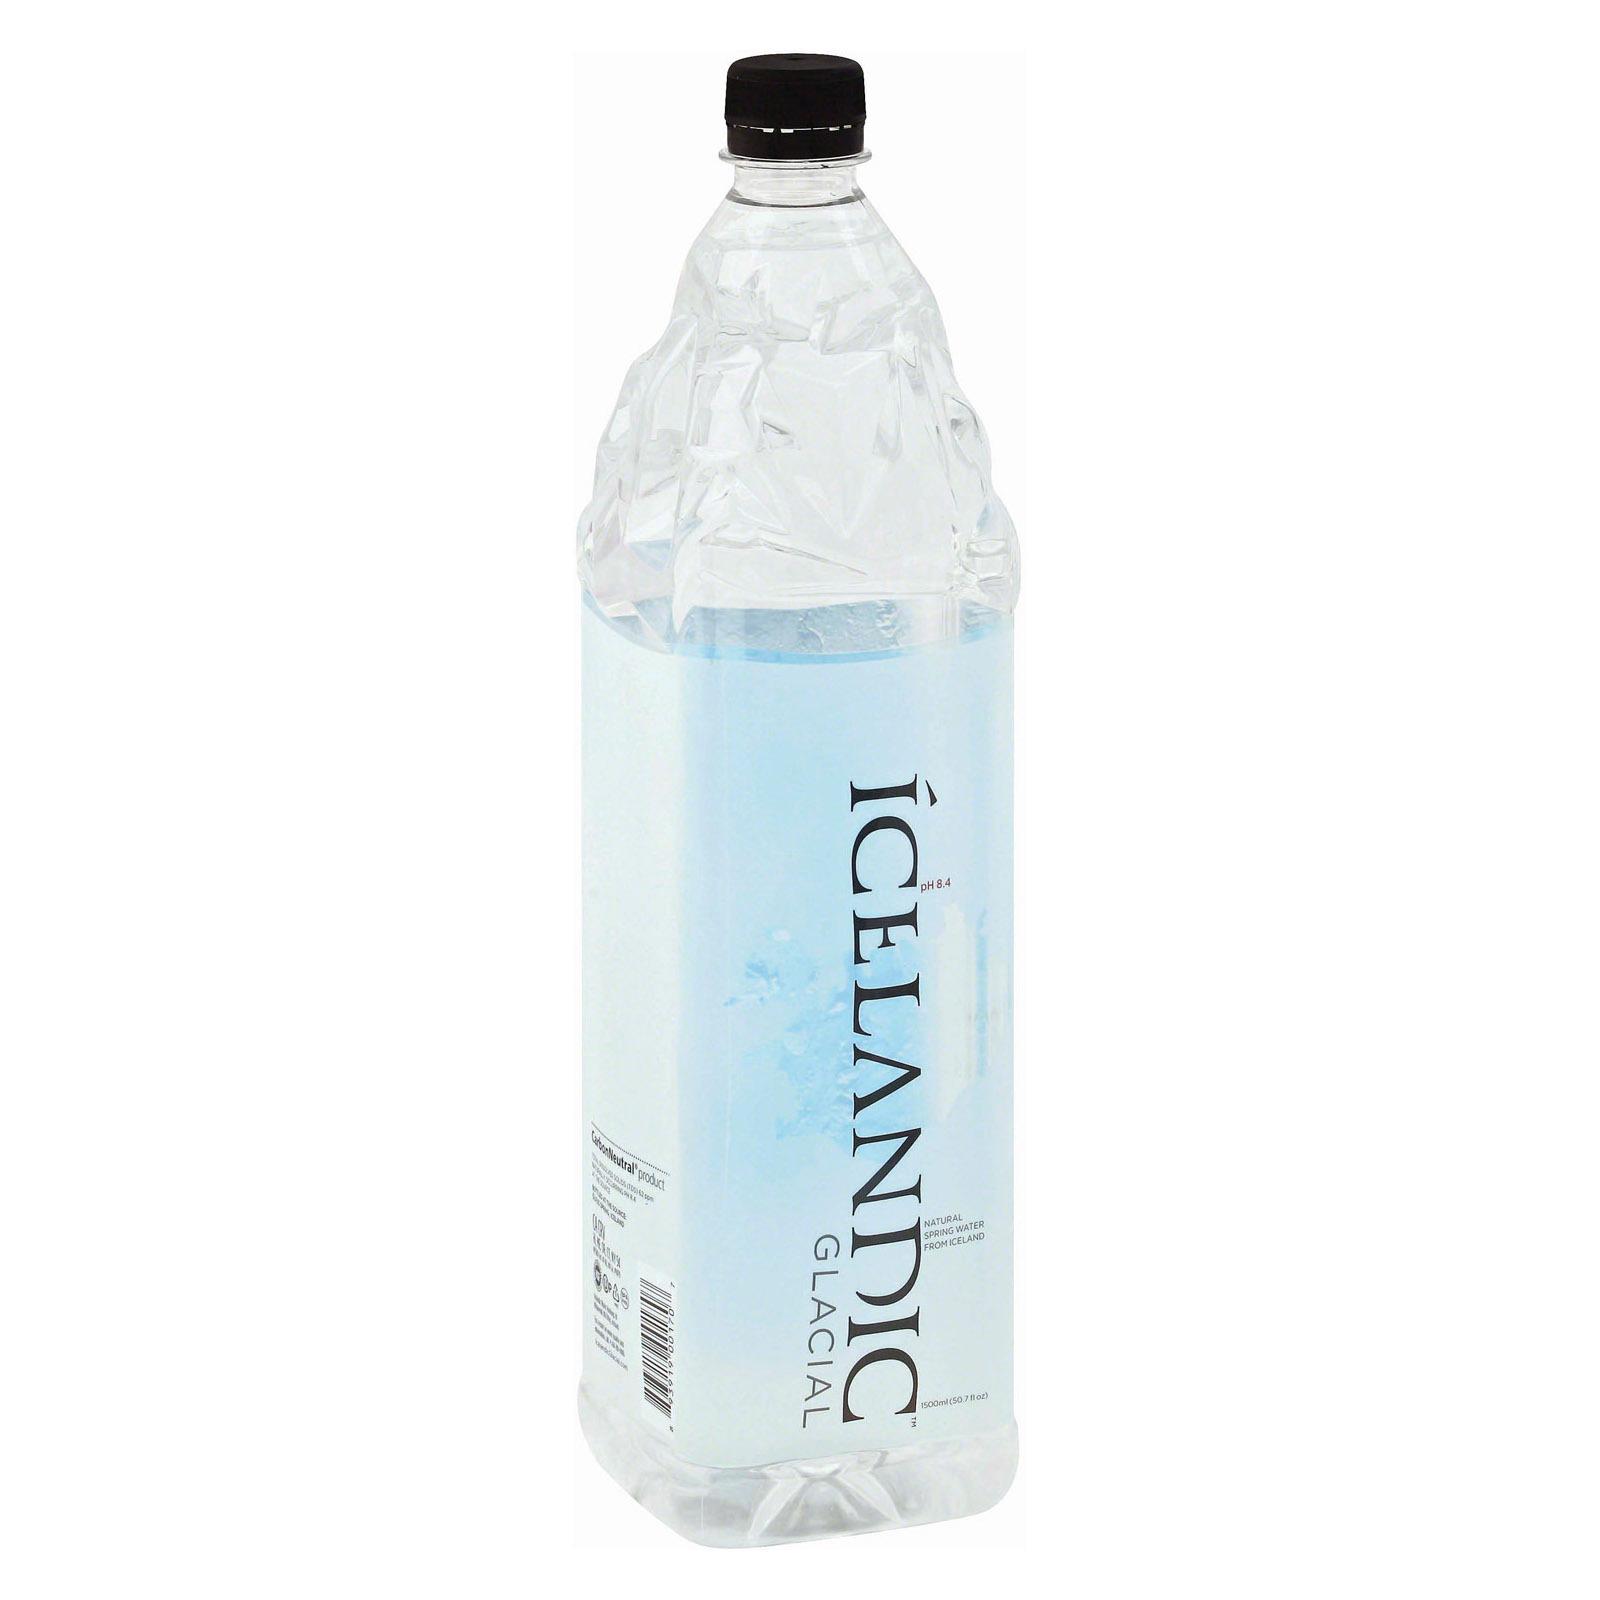 Icelandic Glacial Spring Water - Natural - Case of 12 - 50.7 Fl oz.